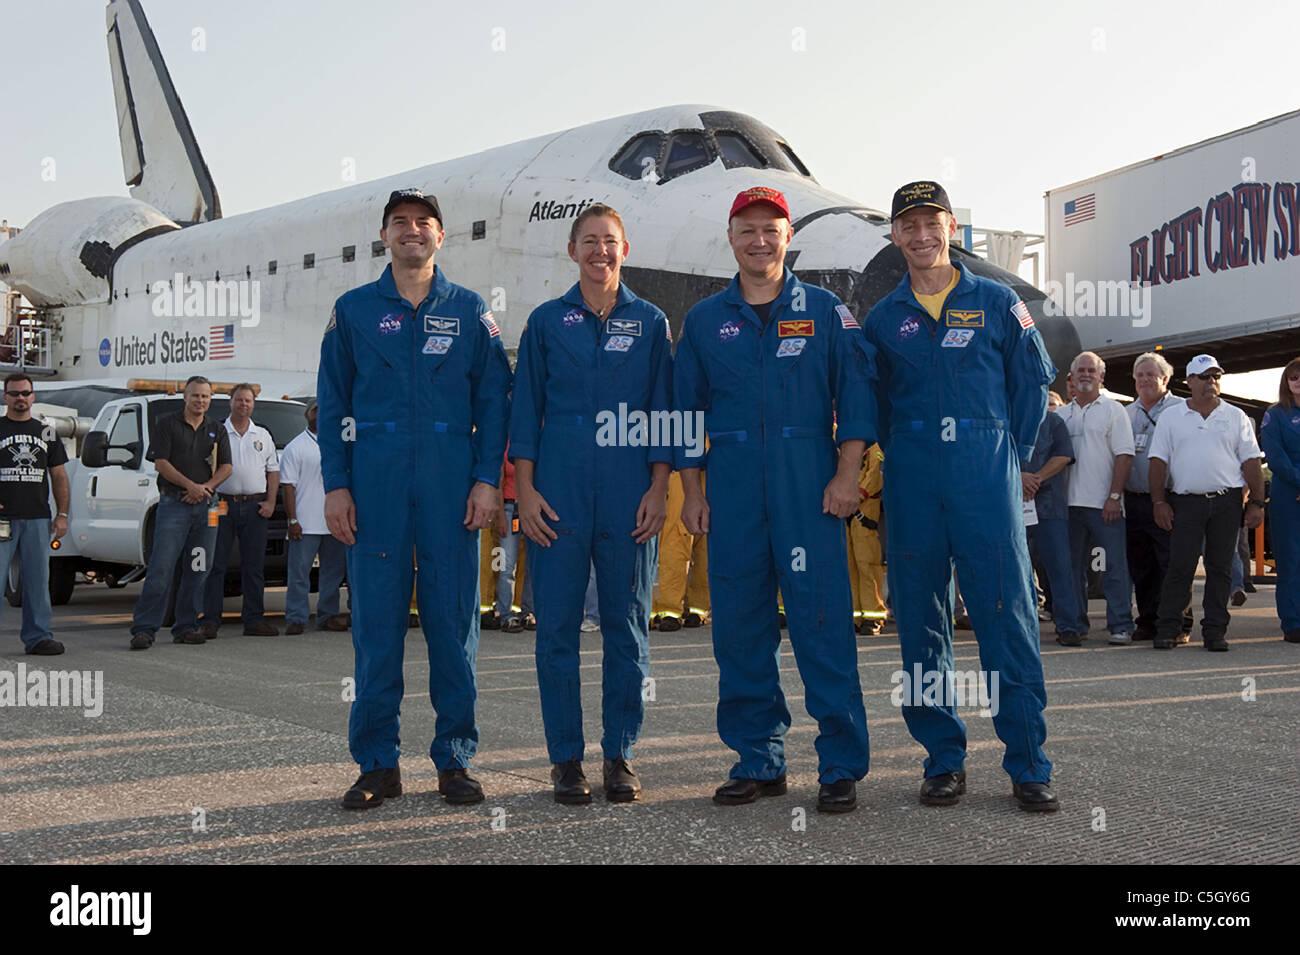 Atlantis Space Shuttle Crew final mission - Stock Image